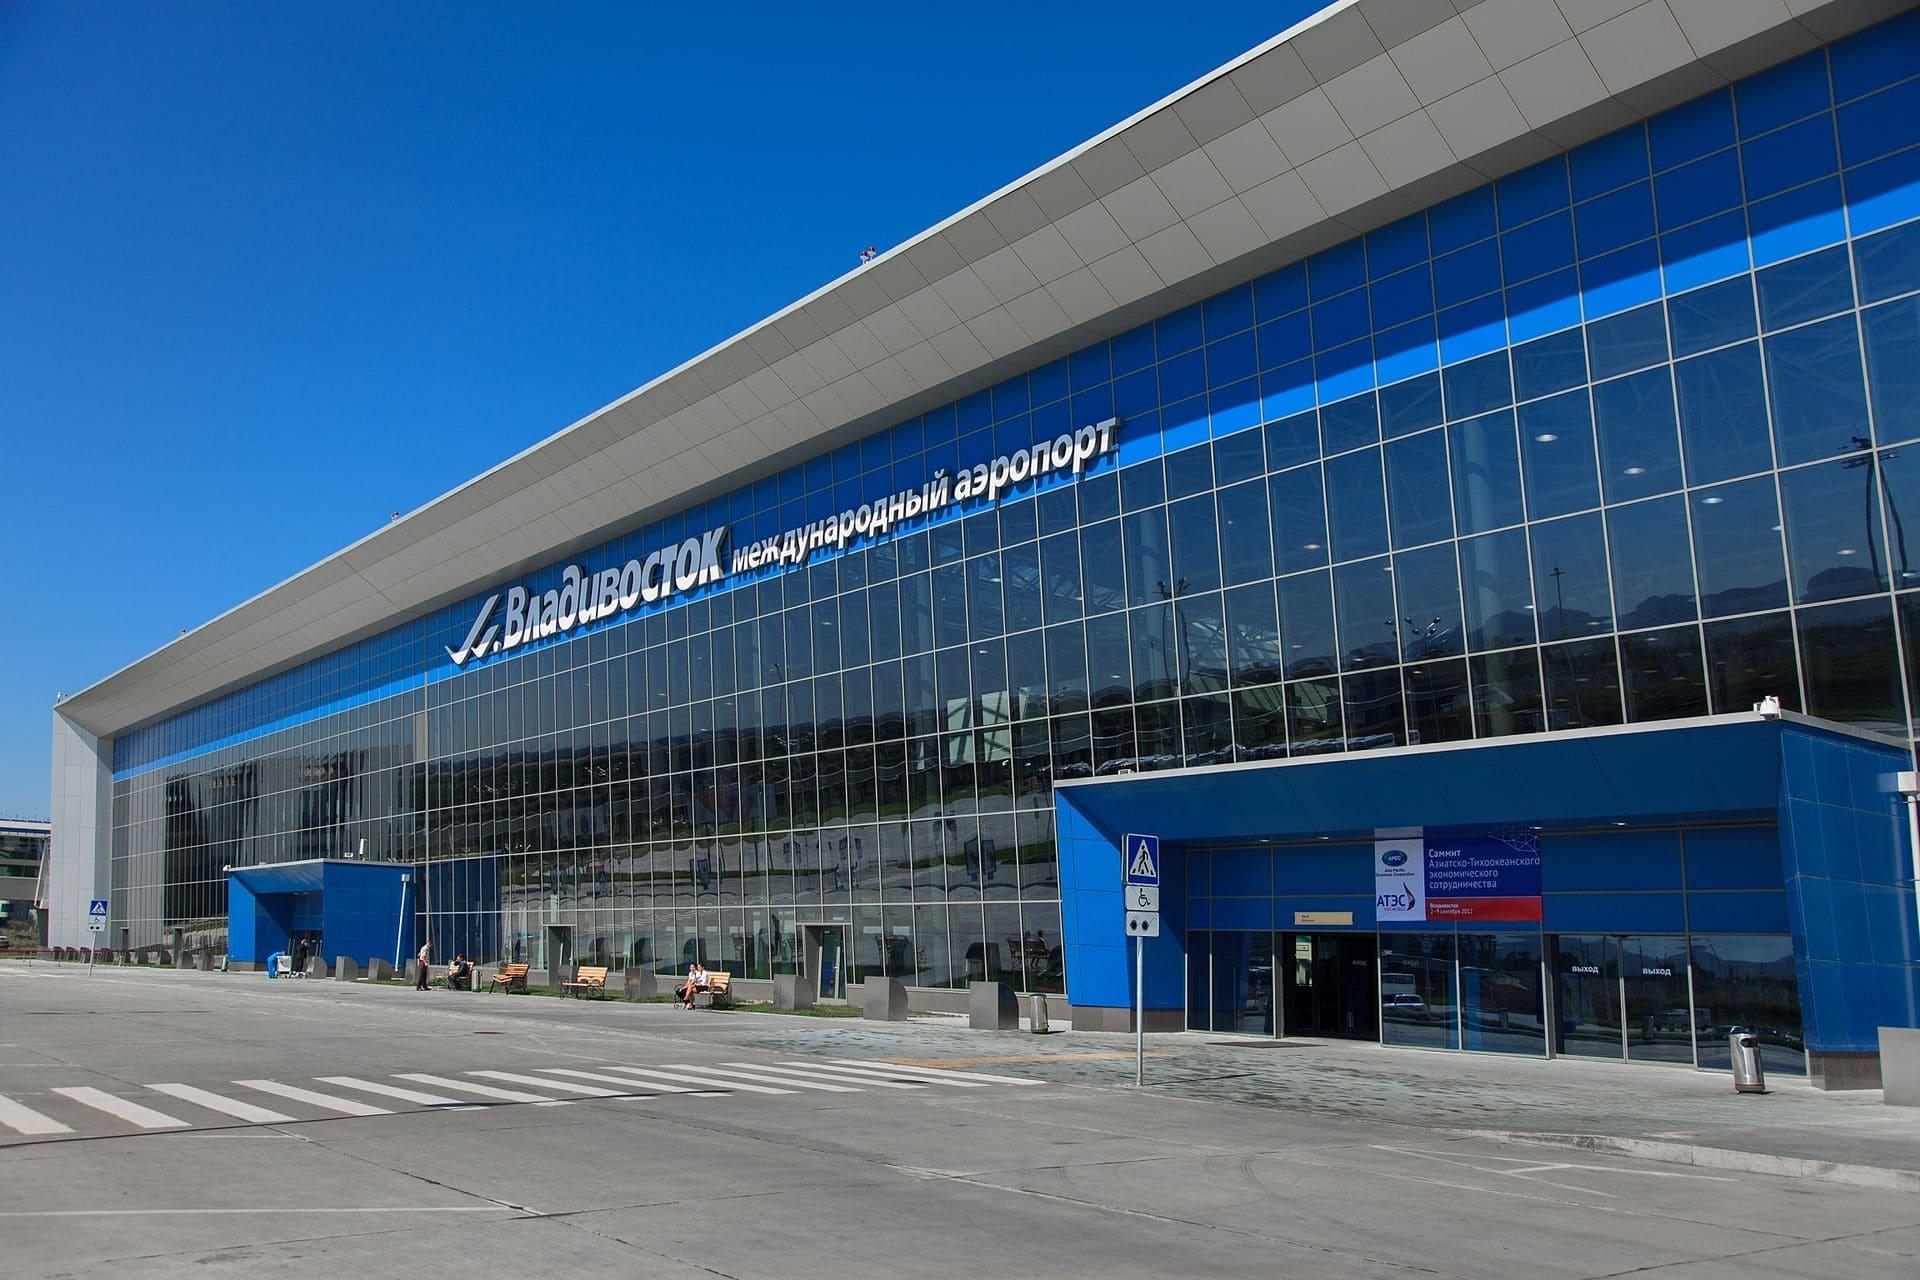 Flughafen Wladiwostok Bild: Maks25rus CC BY-SA 3.0